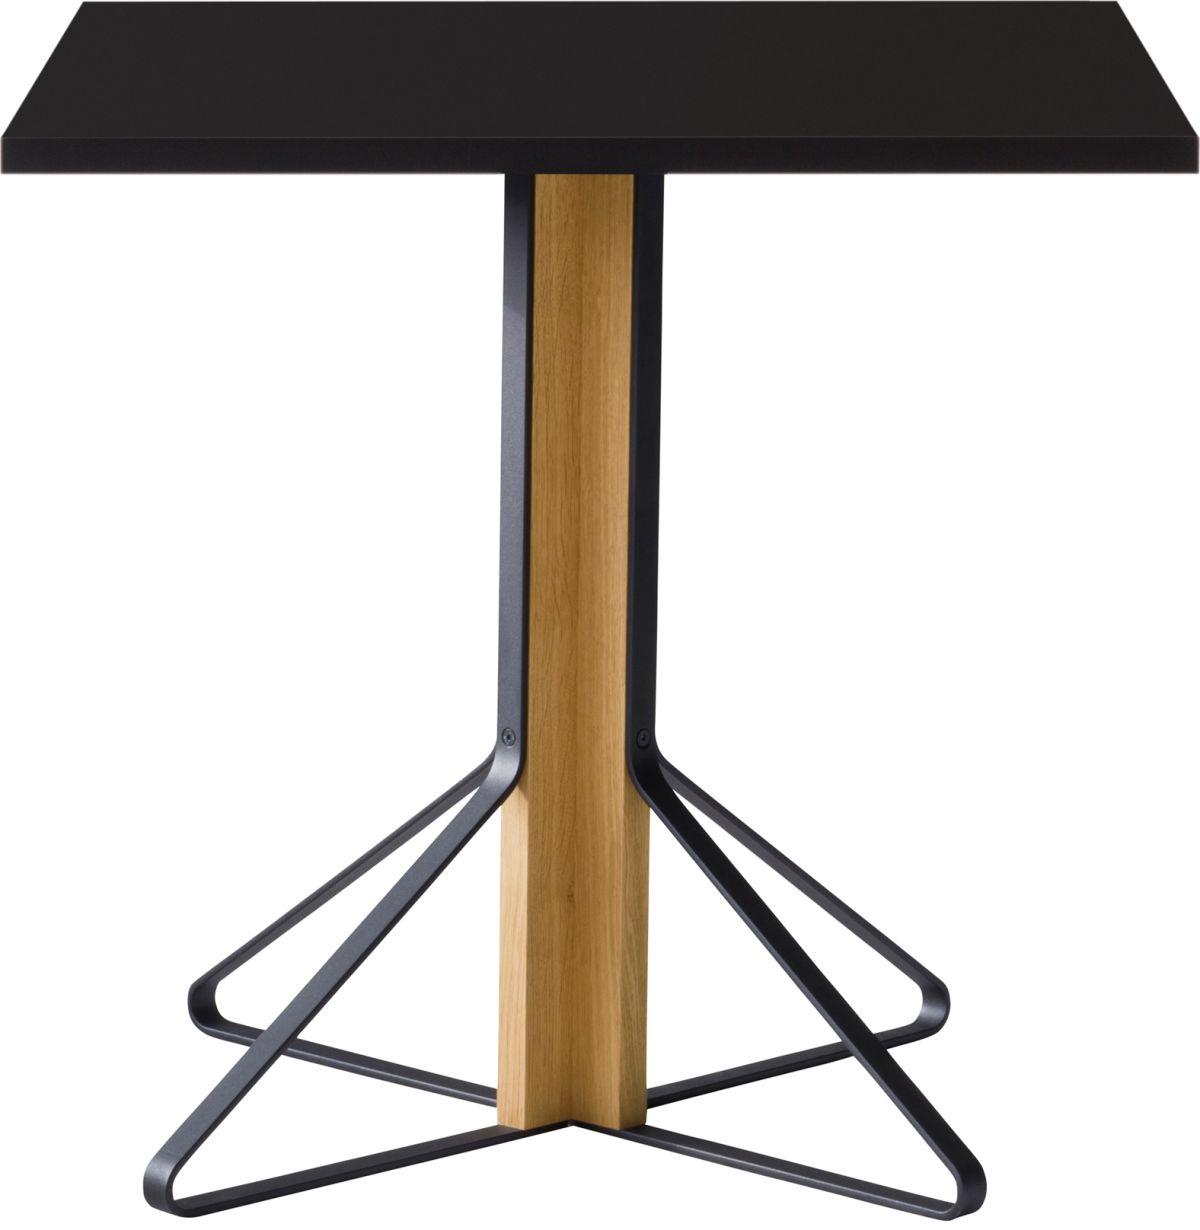 Kaari_Table_Square_Legs-Natural-Oak_Top-Black-Hpl_Cut_Out_Srgb-2430512